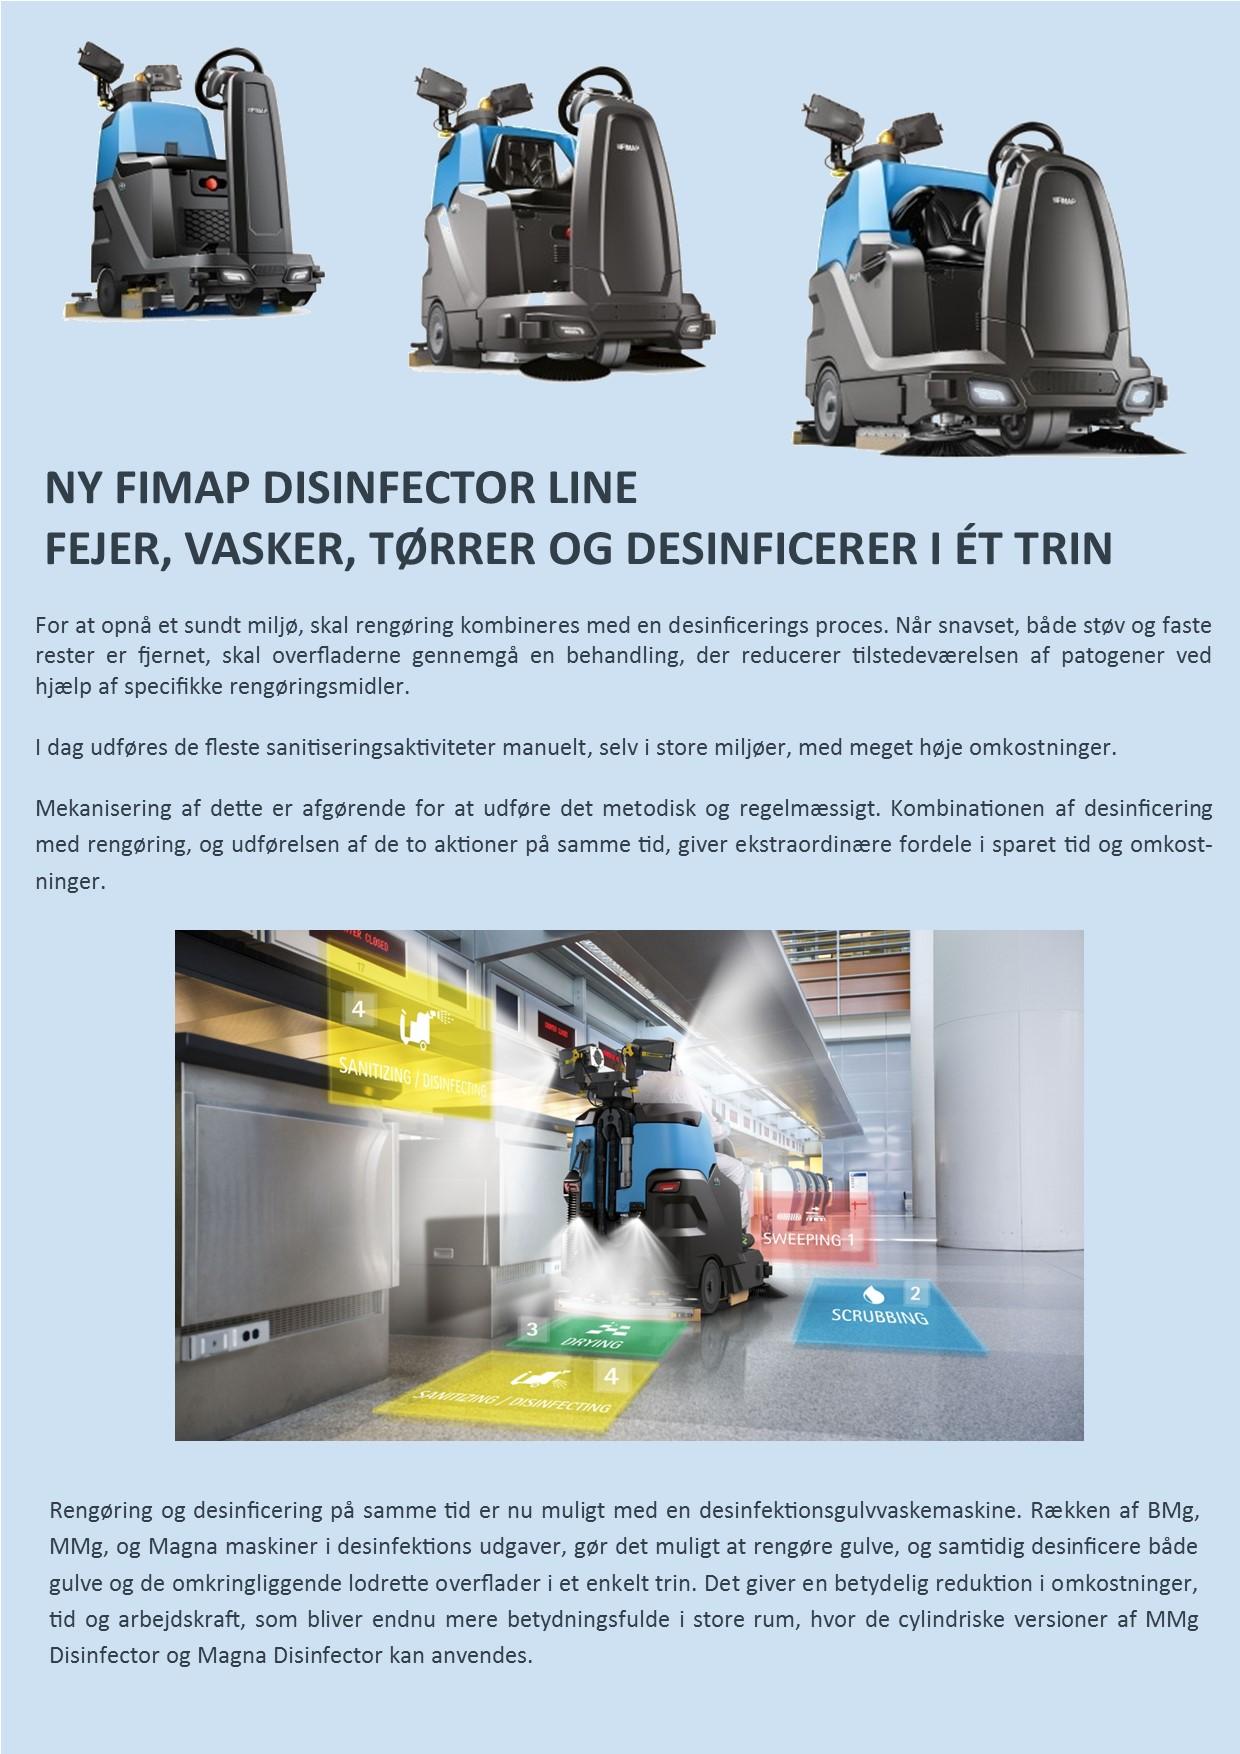 Disinfector Line 1